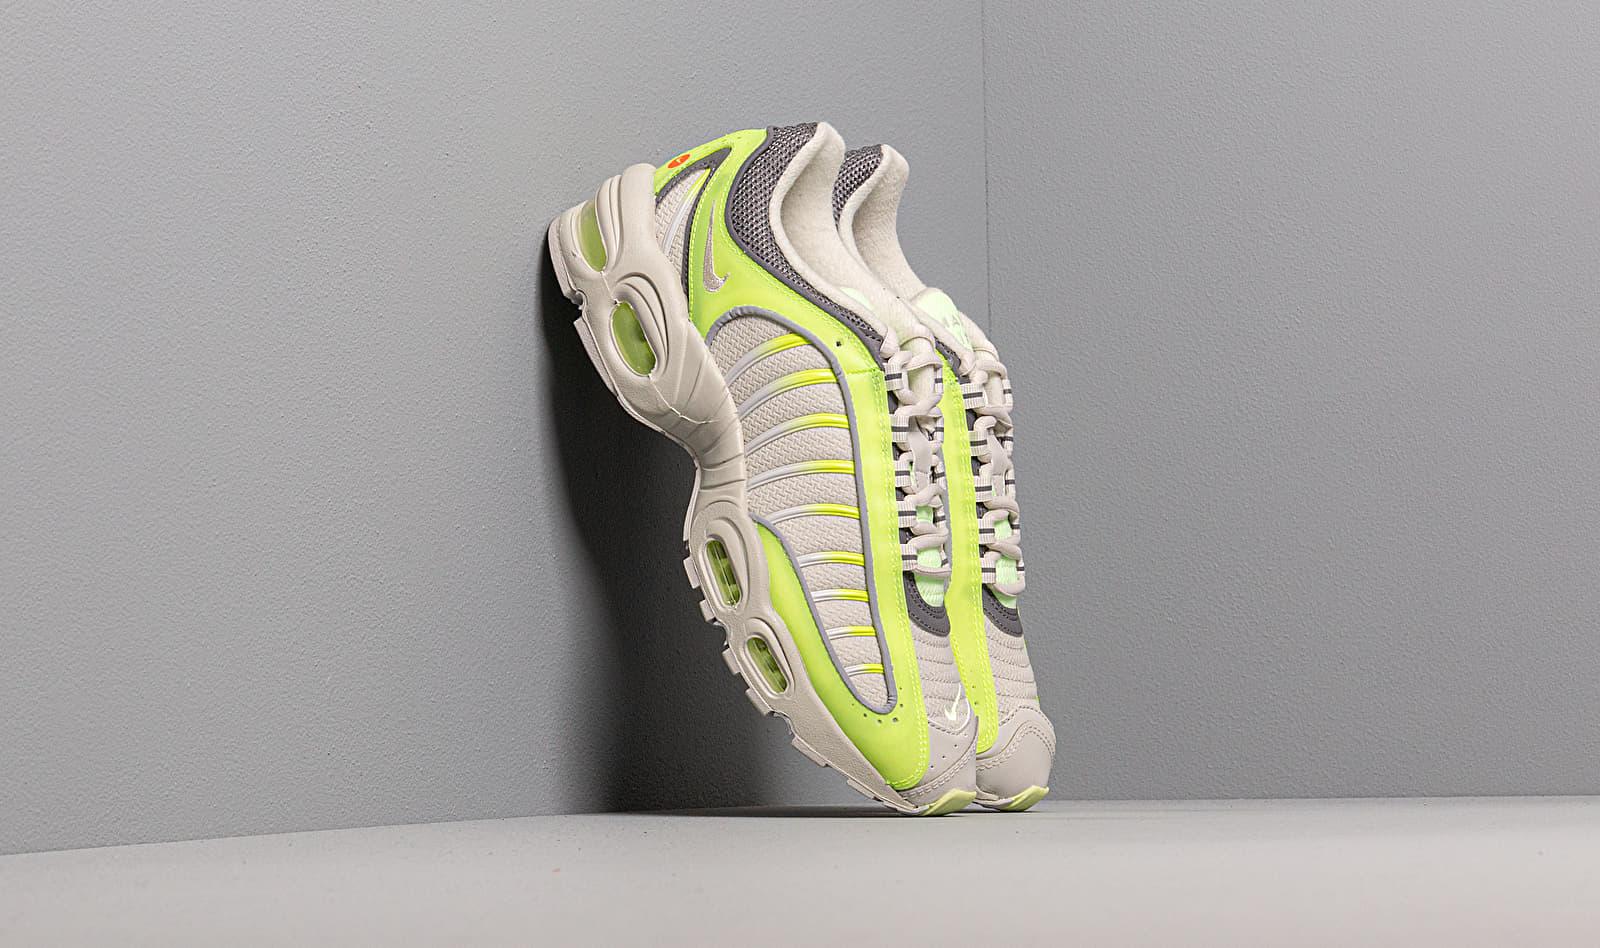 Nike Air Max Tailwind Iv Volt/ Light Bone-Gunsmoke-Barely Volt CJ0784-700